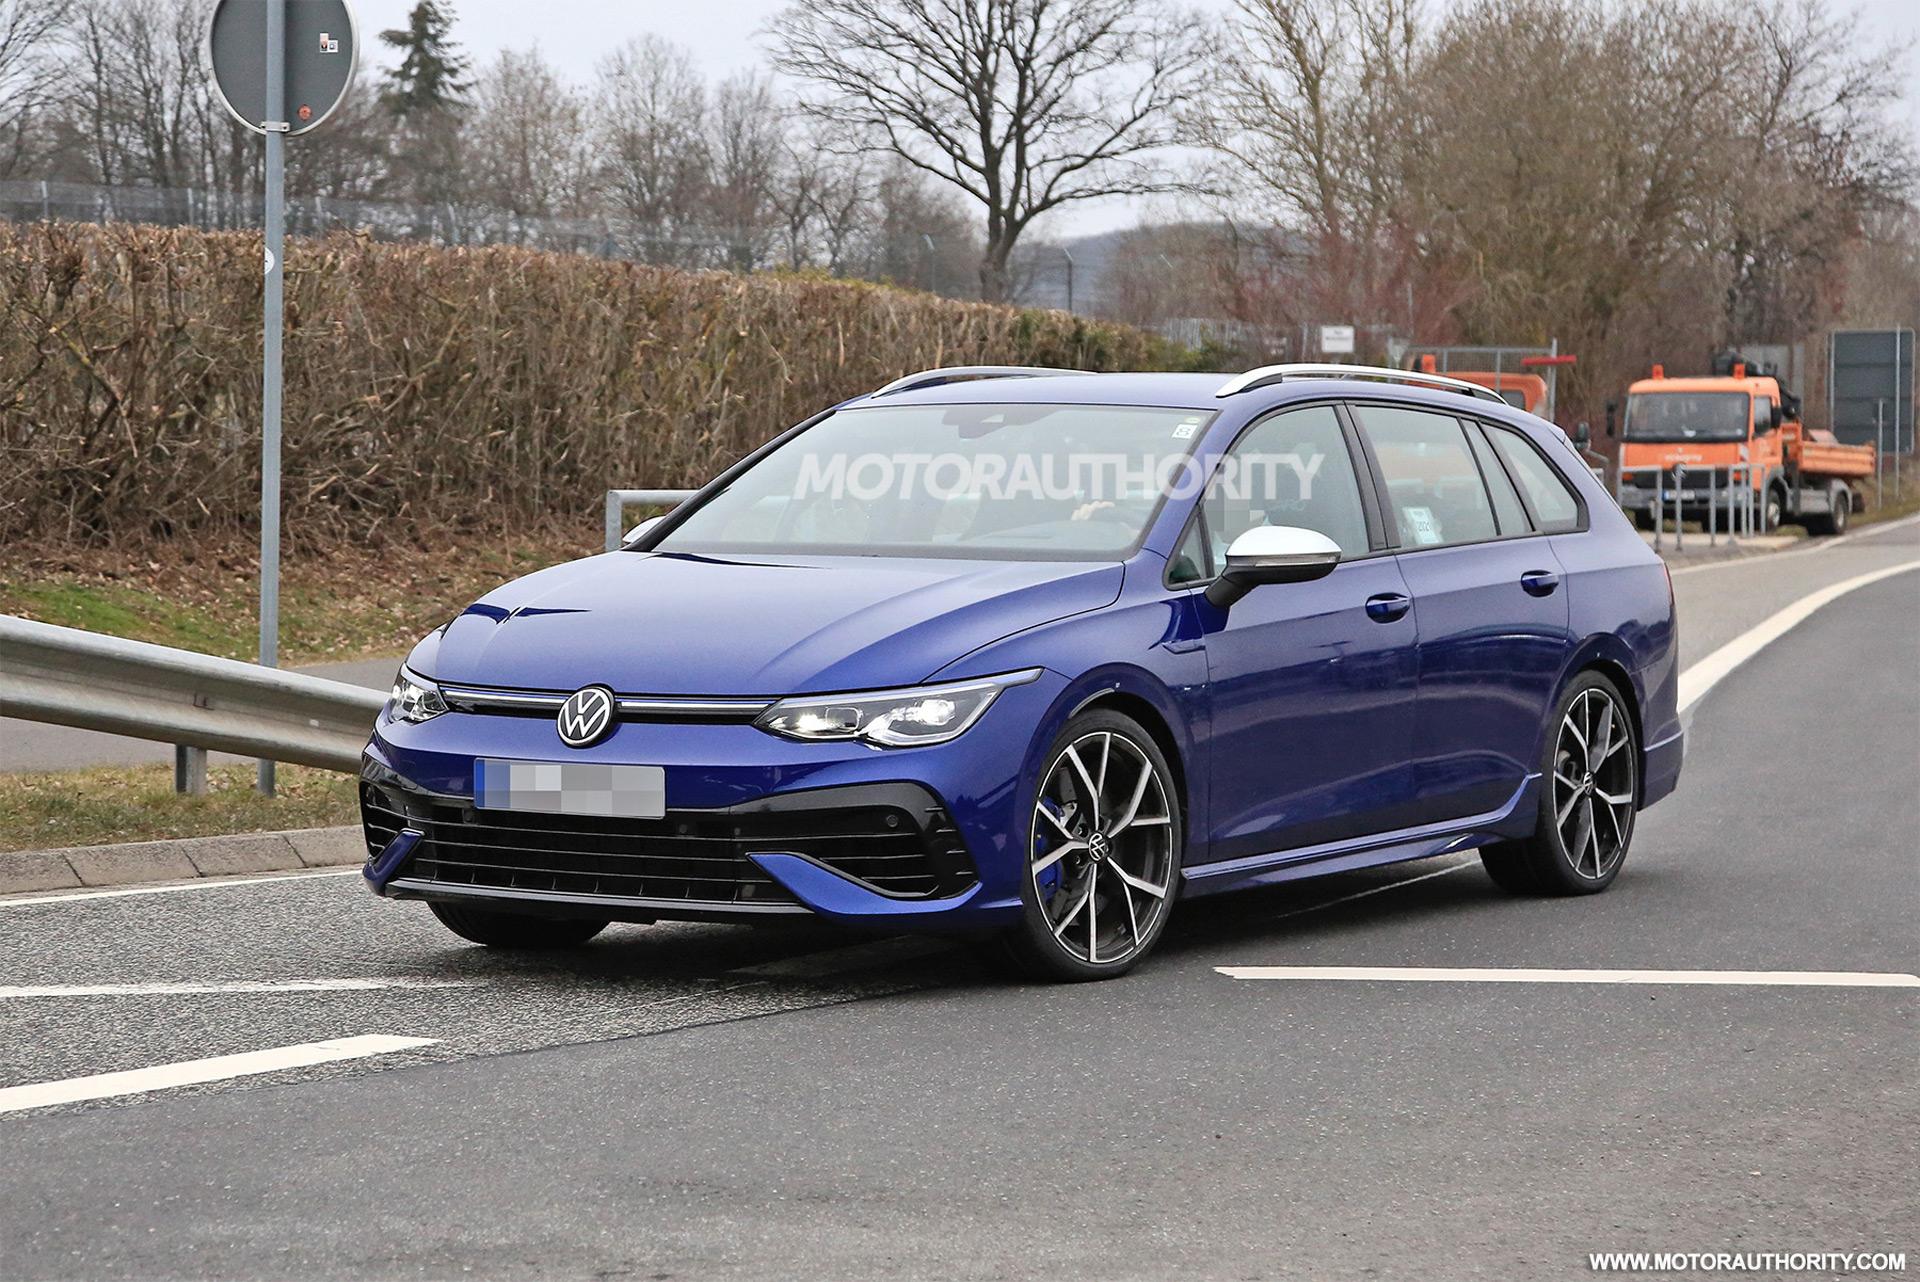 2022 Volkswagen Golf R Variant spy shots: Hot wagon to remain forbidden fruit